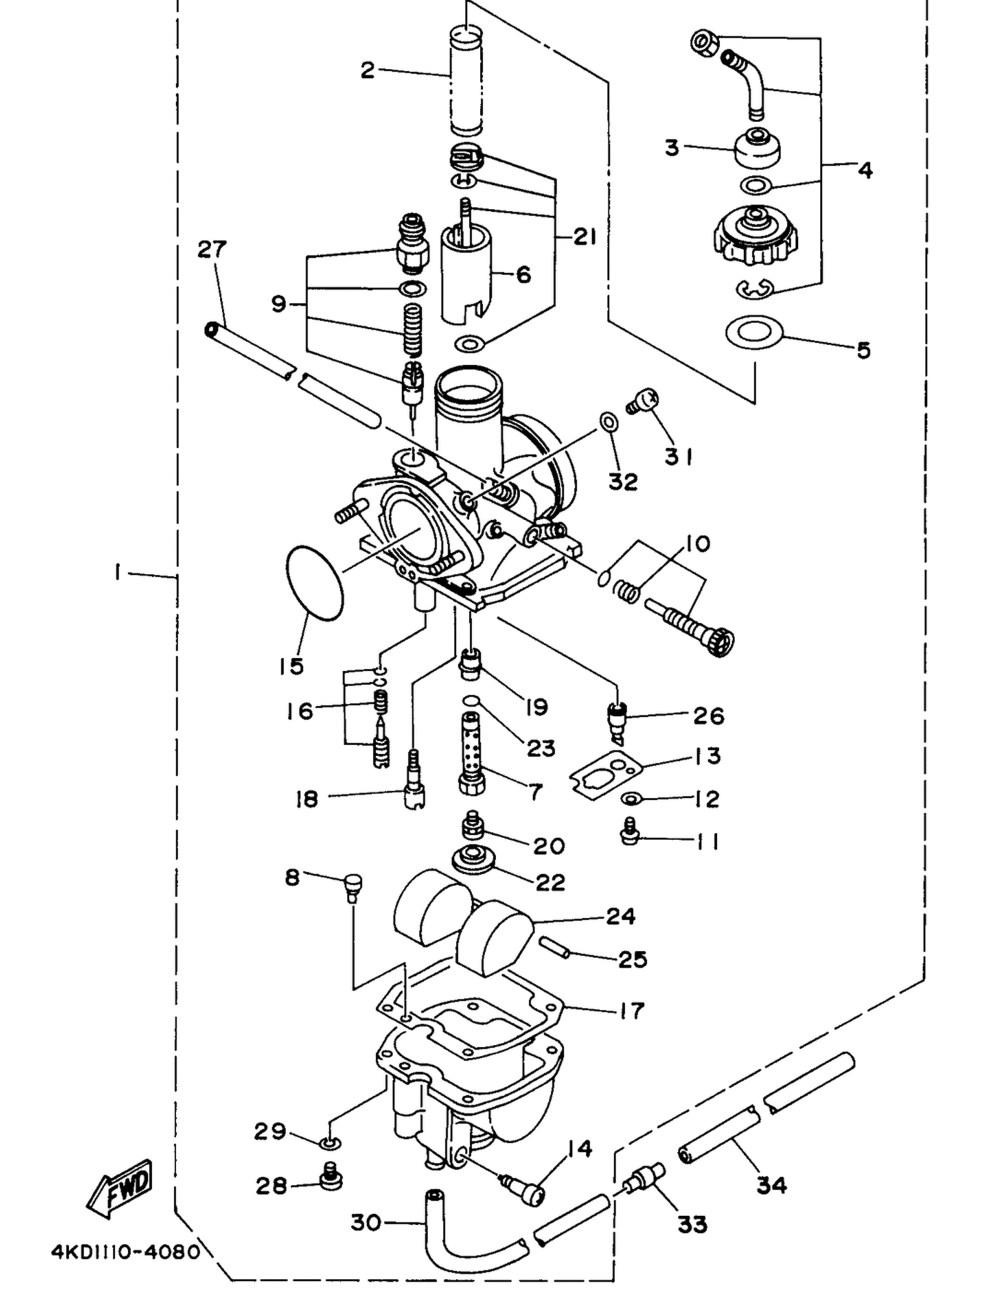 medium resolution of xsvi 6502 nav wiring diagram collection carburetor wiring diagram new 1998 yamaha timberwolf 250 2wd